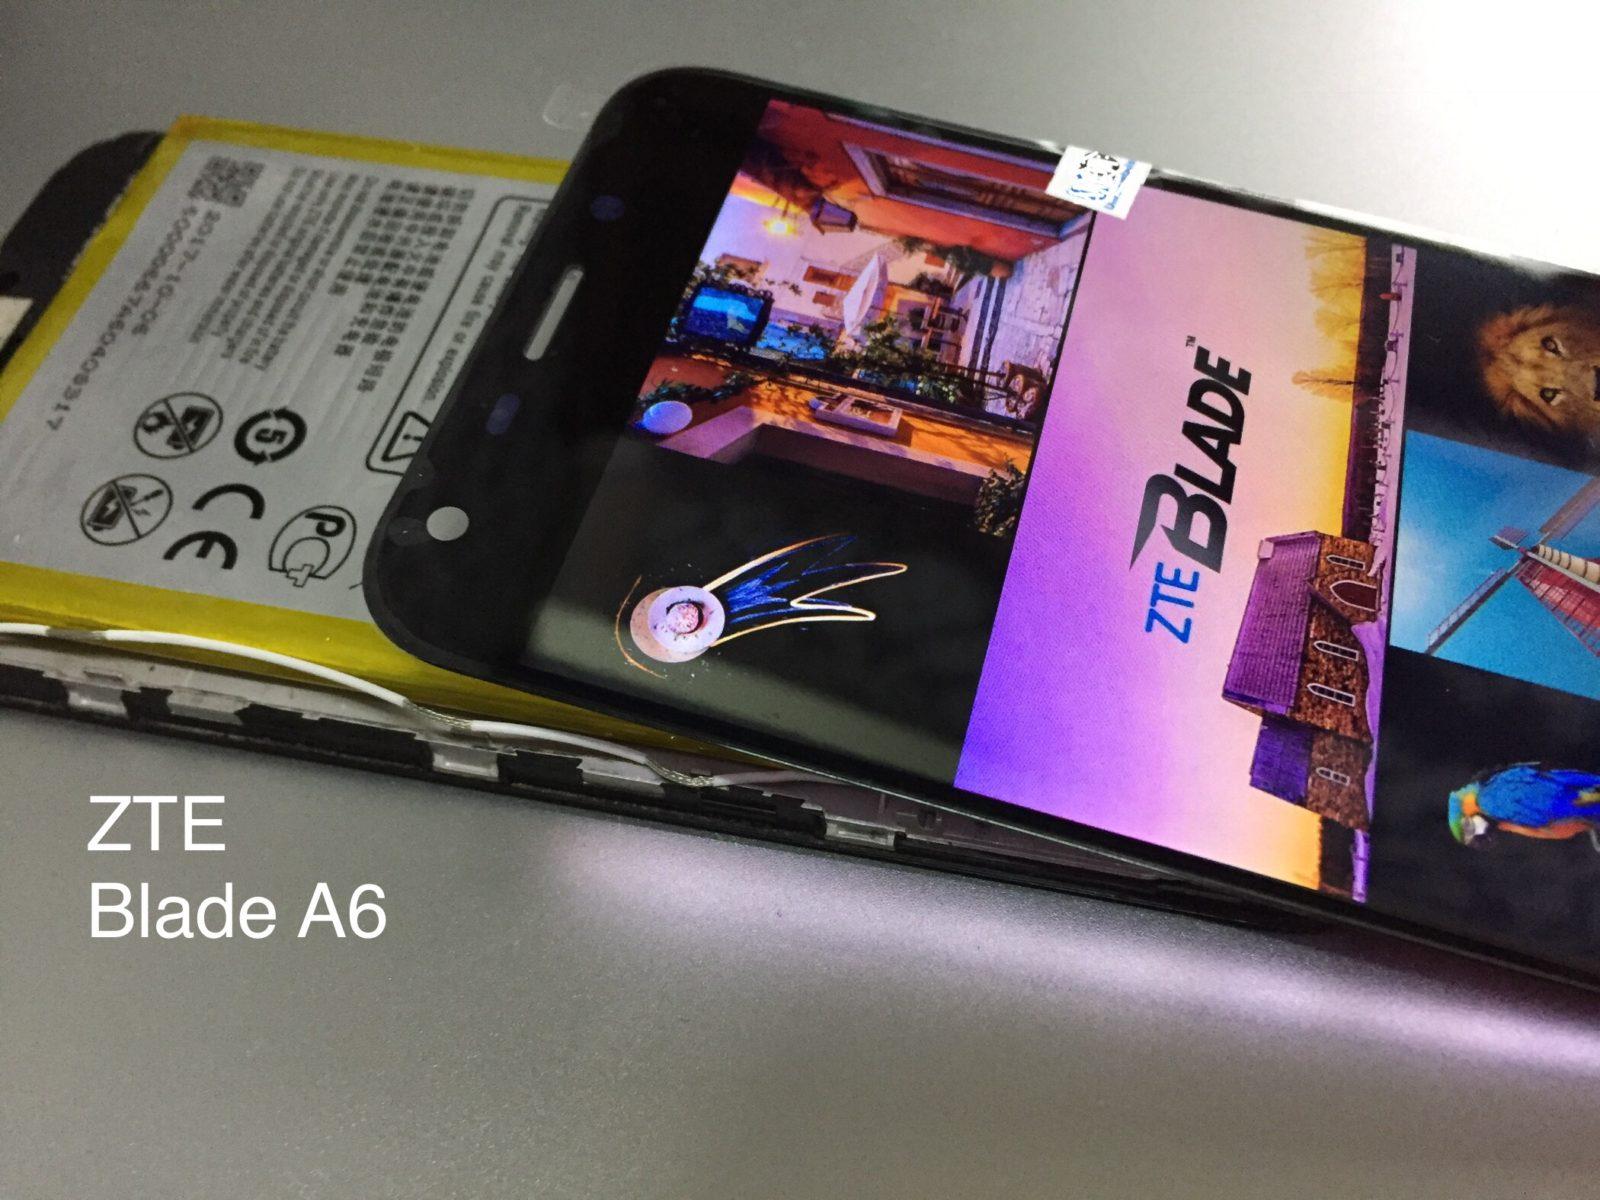 ZTE Blade A6 (A0622) стекло разбивашки. Дисплея заменяшки